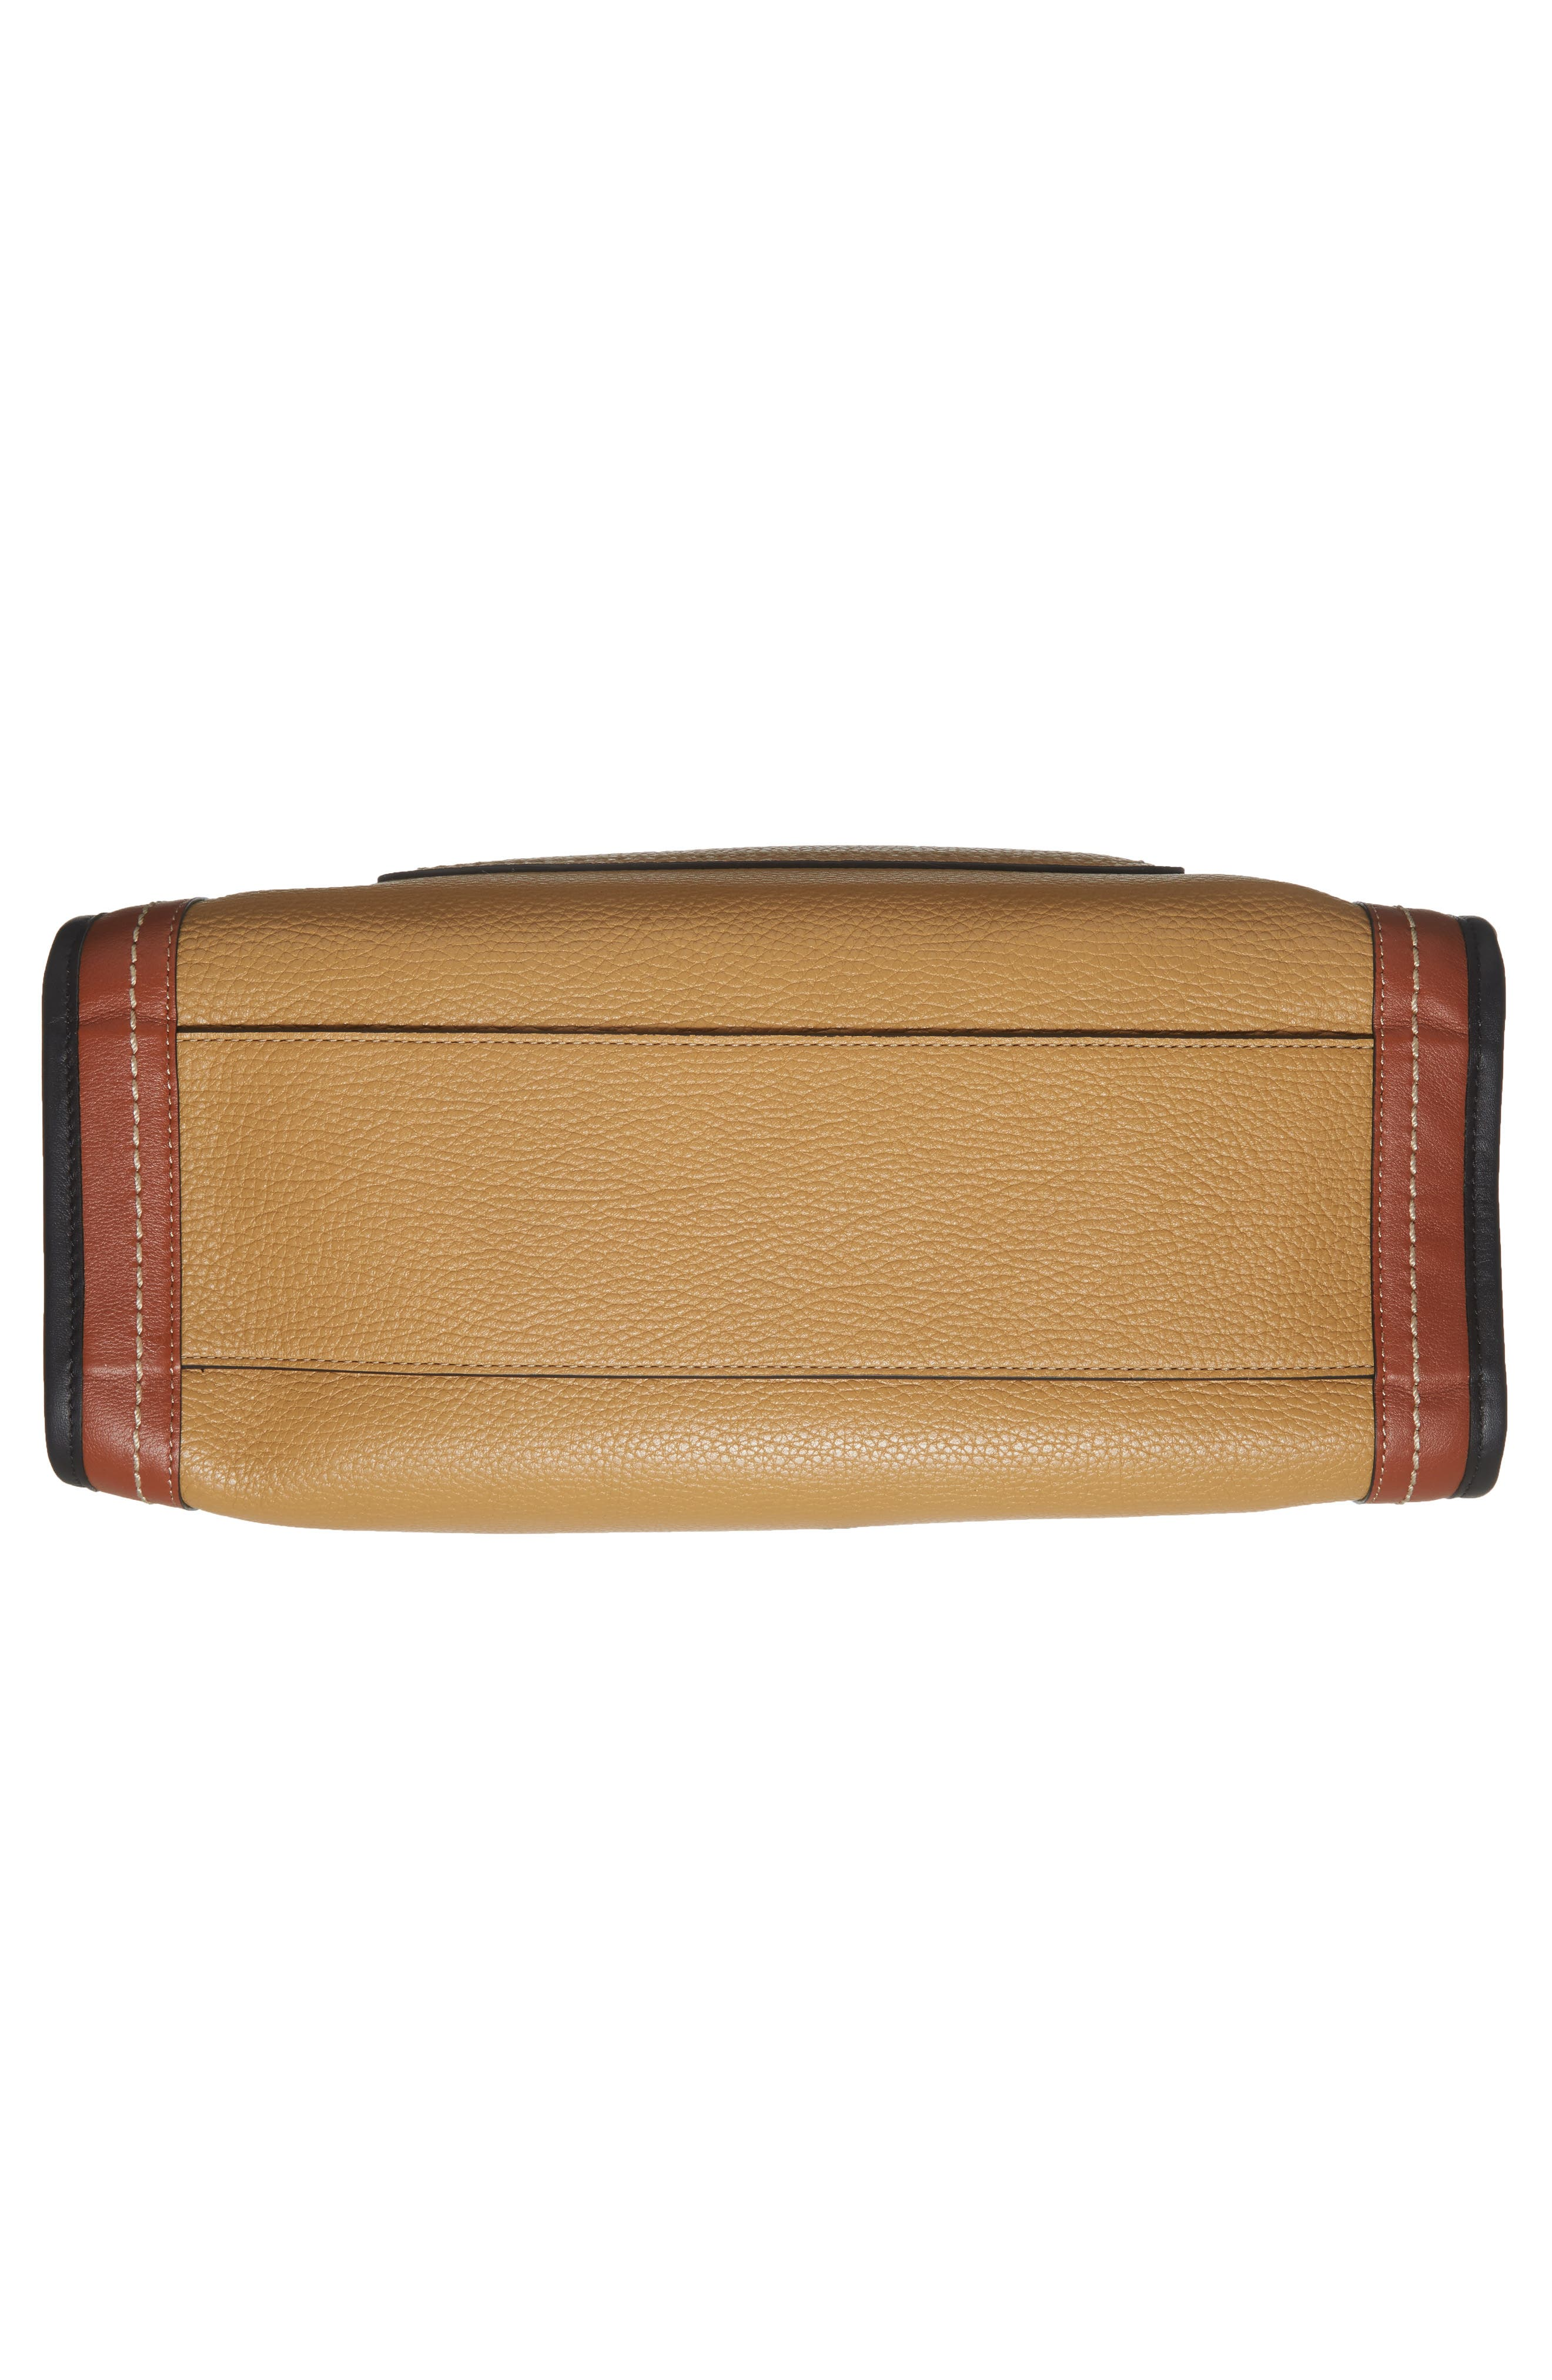 The Dalmatian Grind East/West Leather Shopper & Genuine Calf Hair Pouch,                             Alternate thumbnail 6, color,                             250